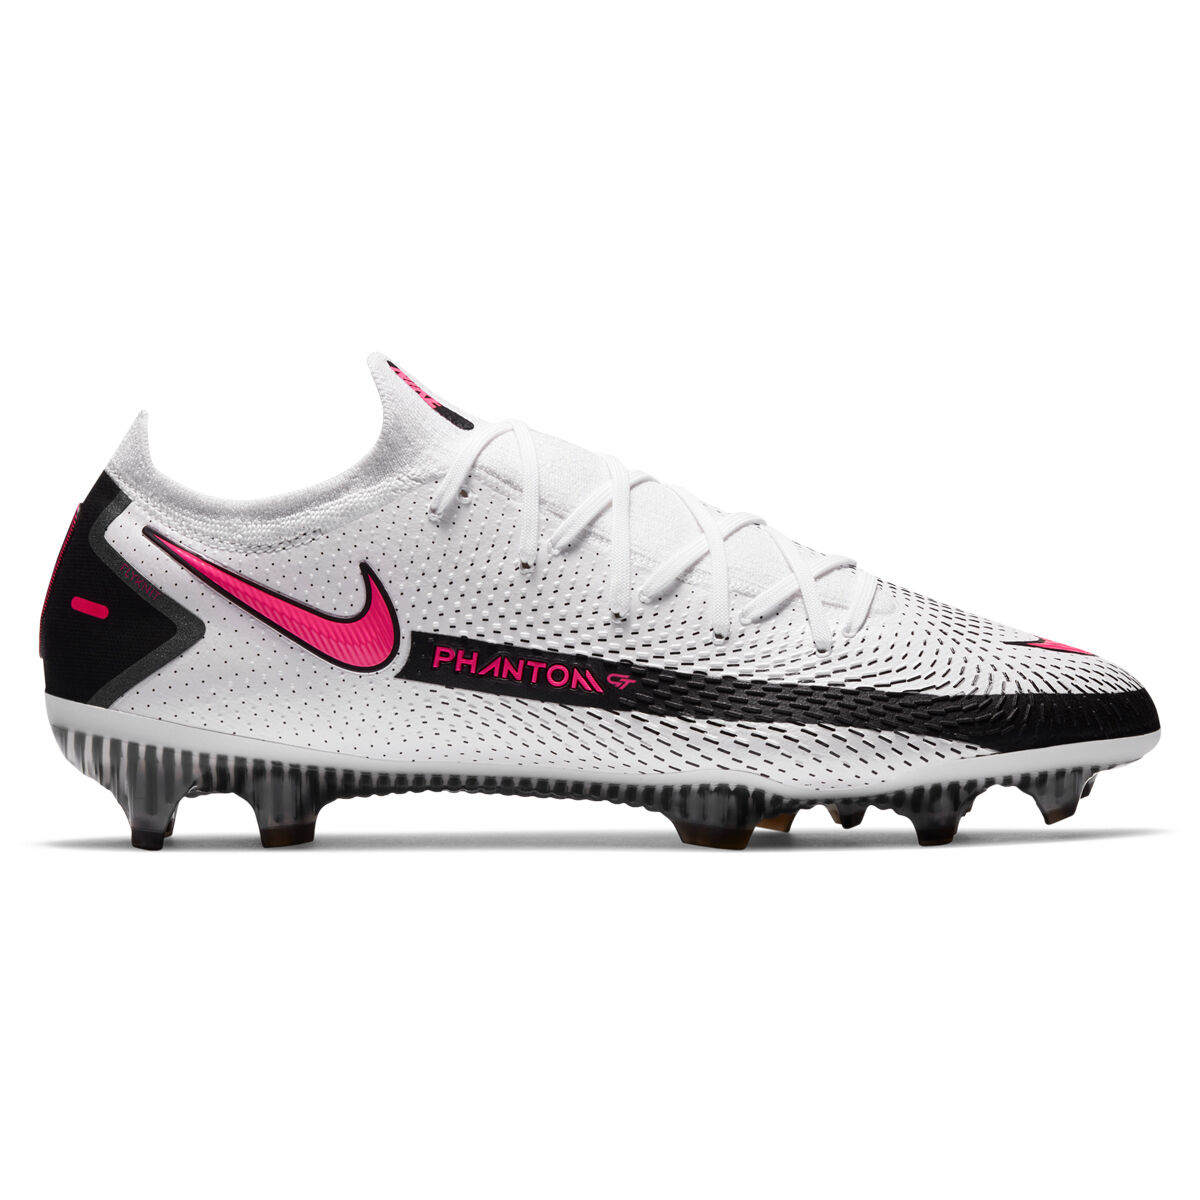 Nike Phantom GT Elite Football Boots